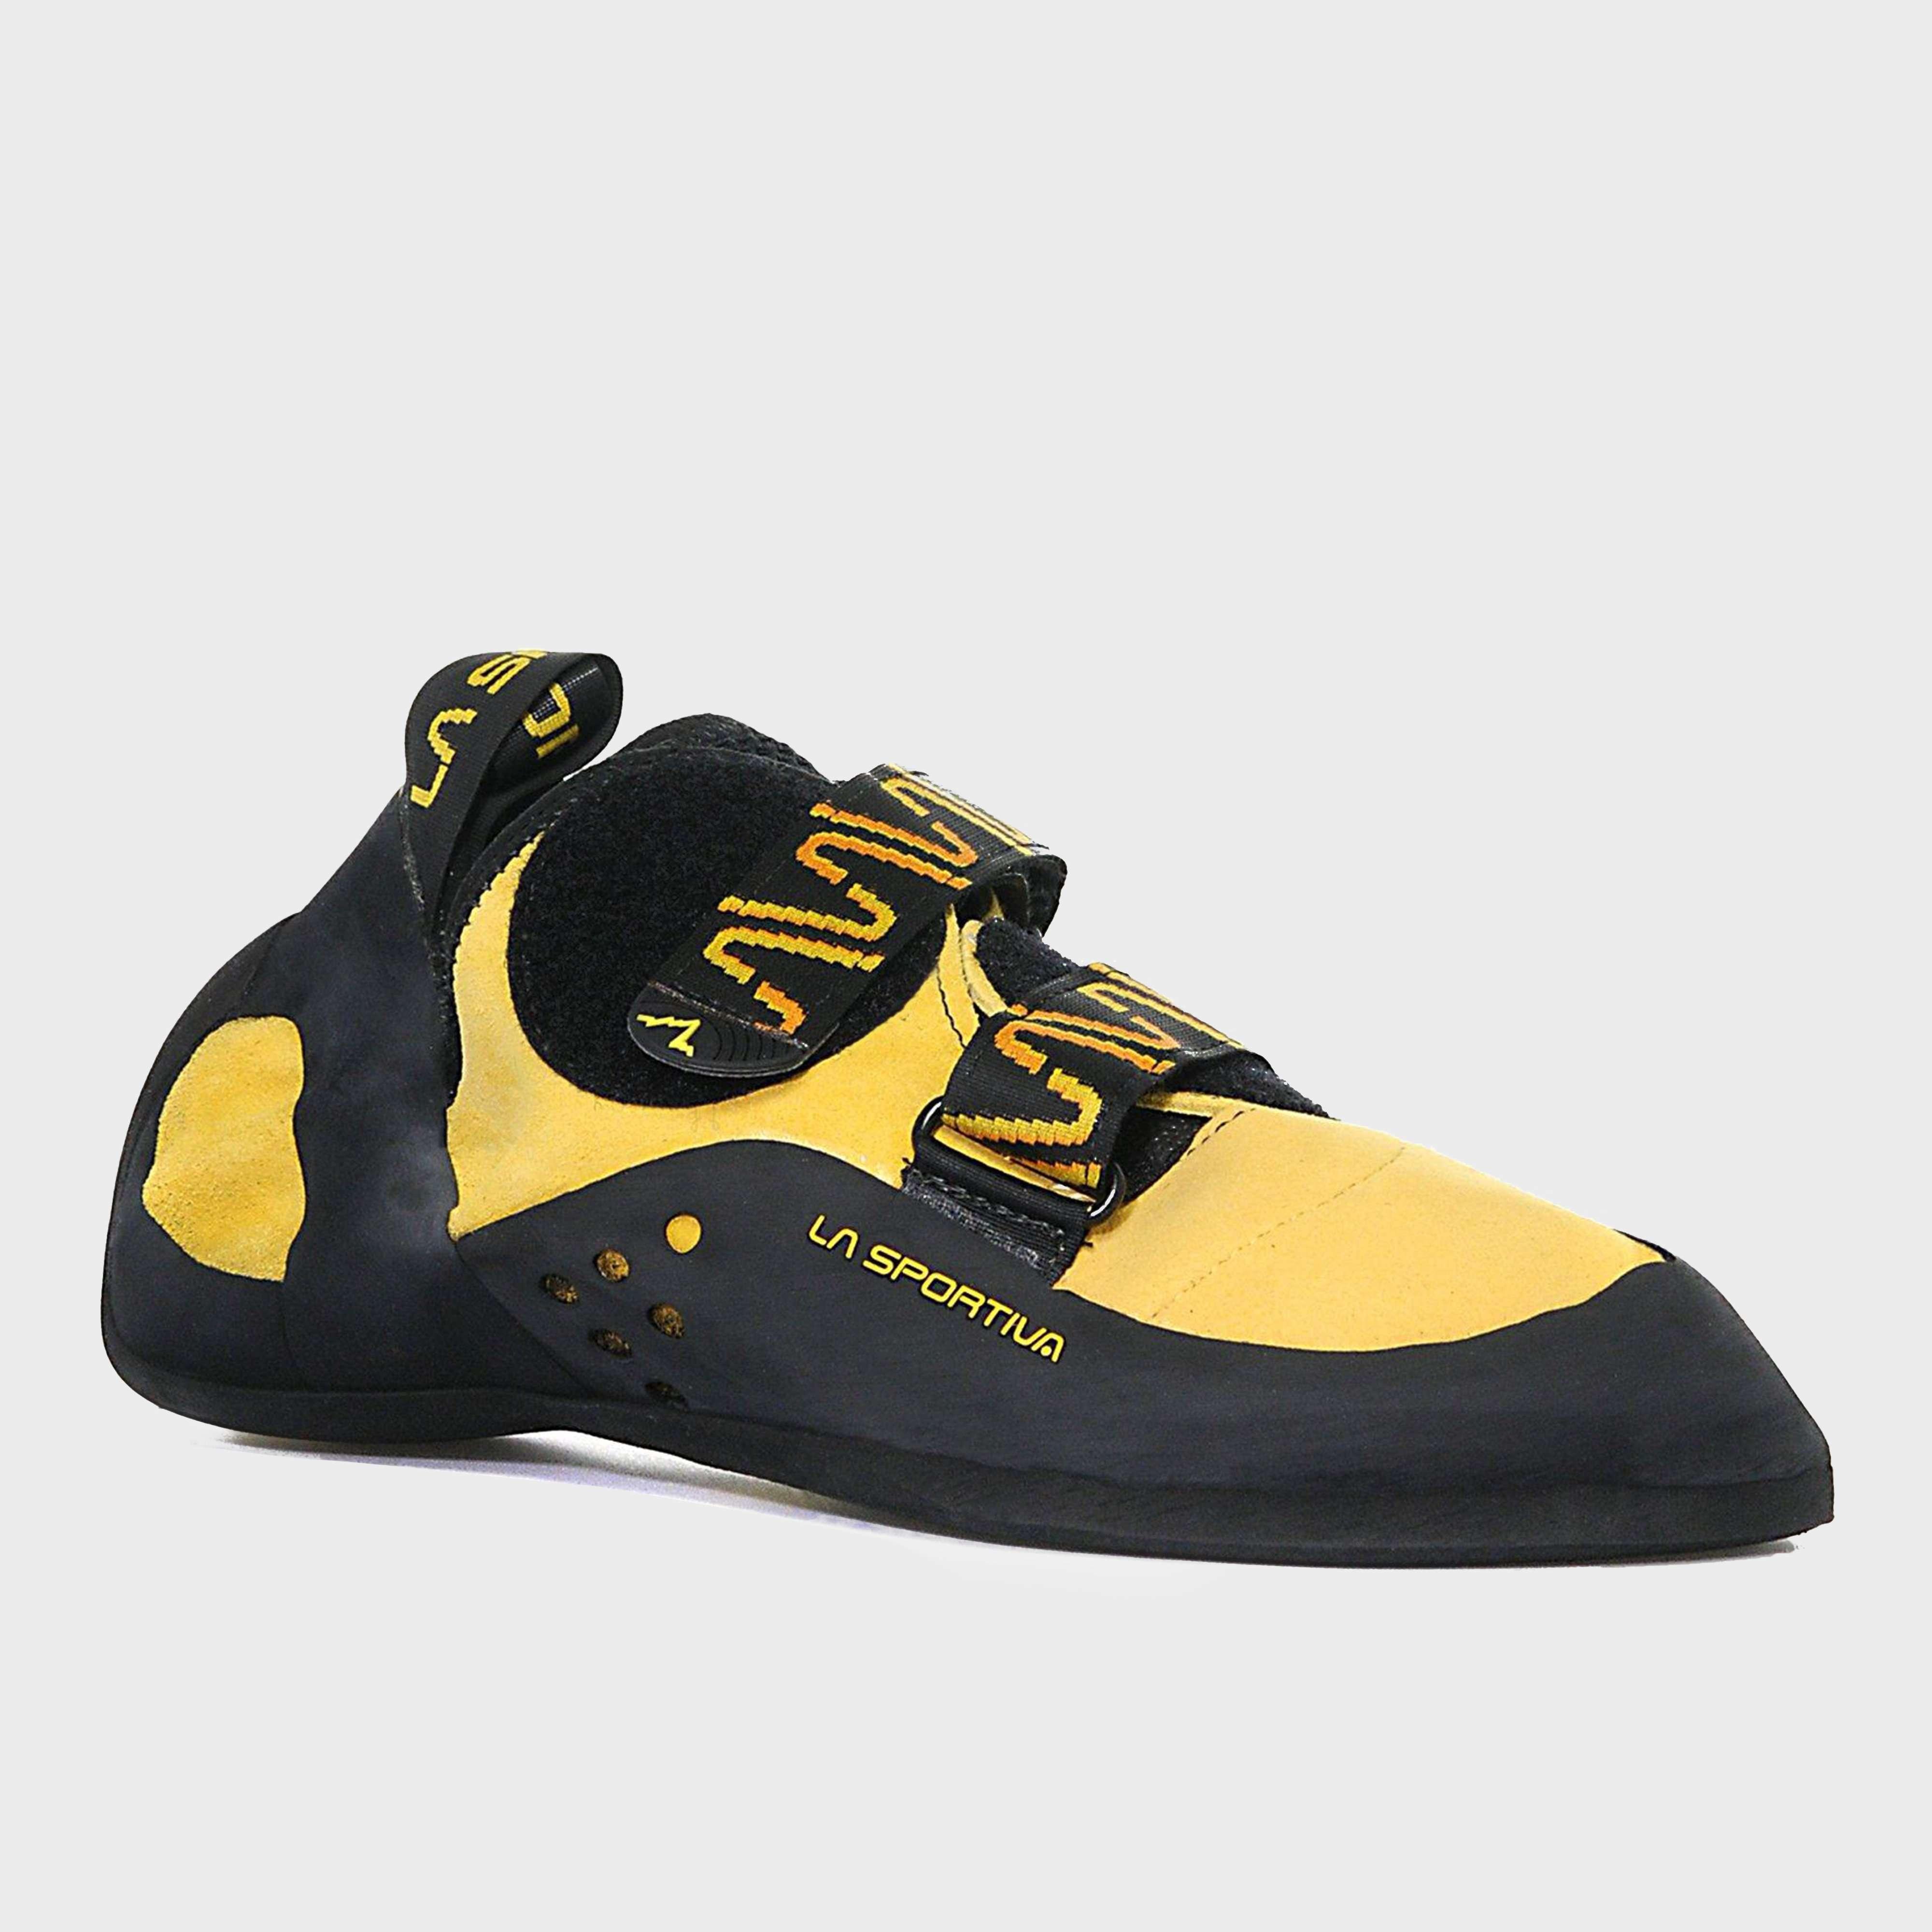 LA SPORTIVA Katana Men's Climbing Shoe